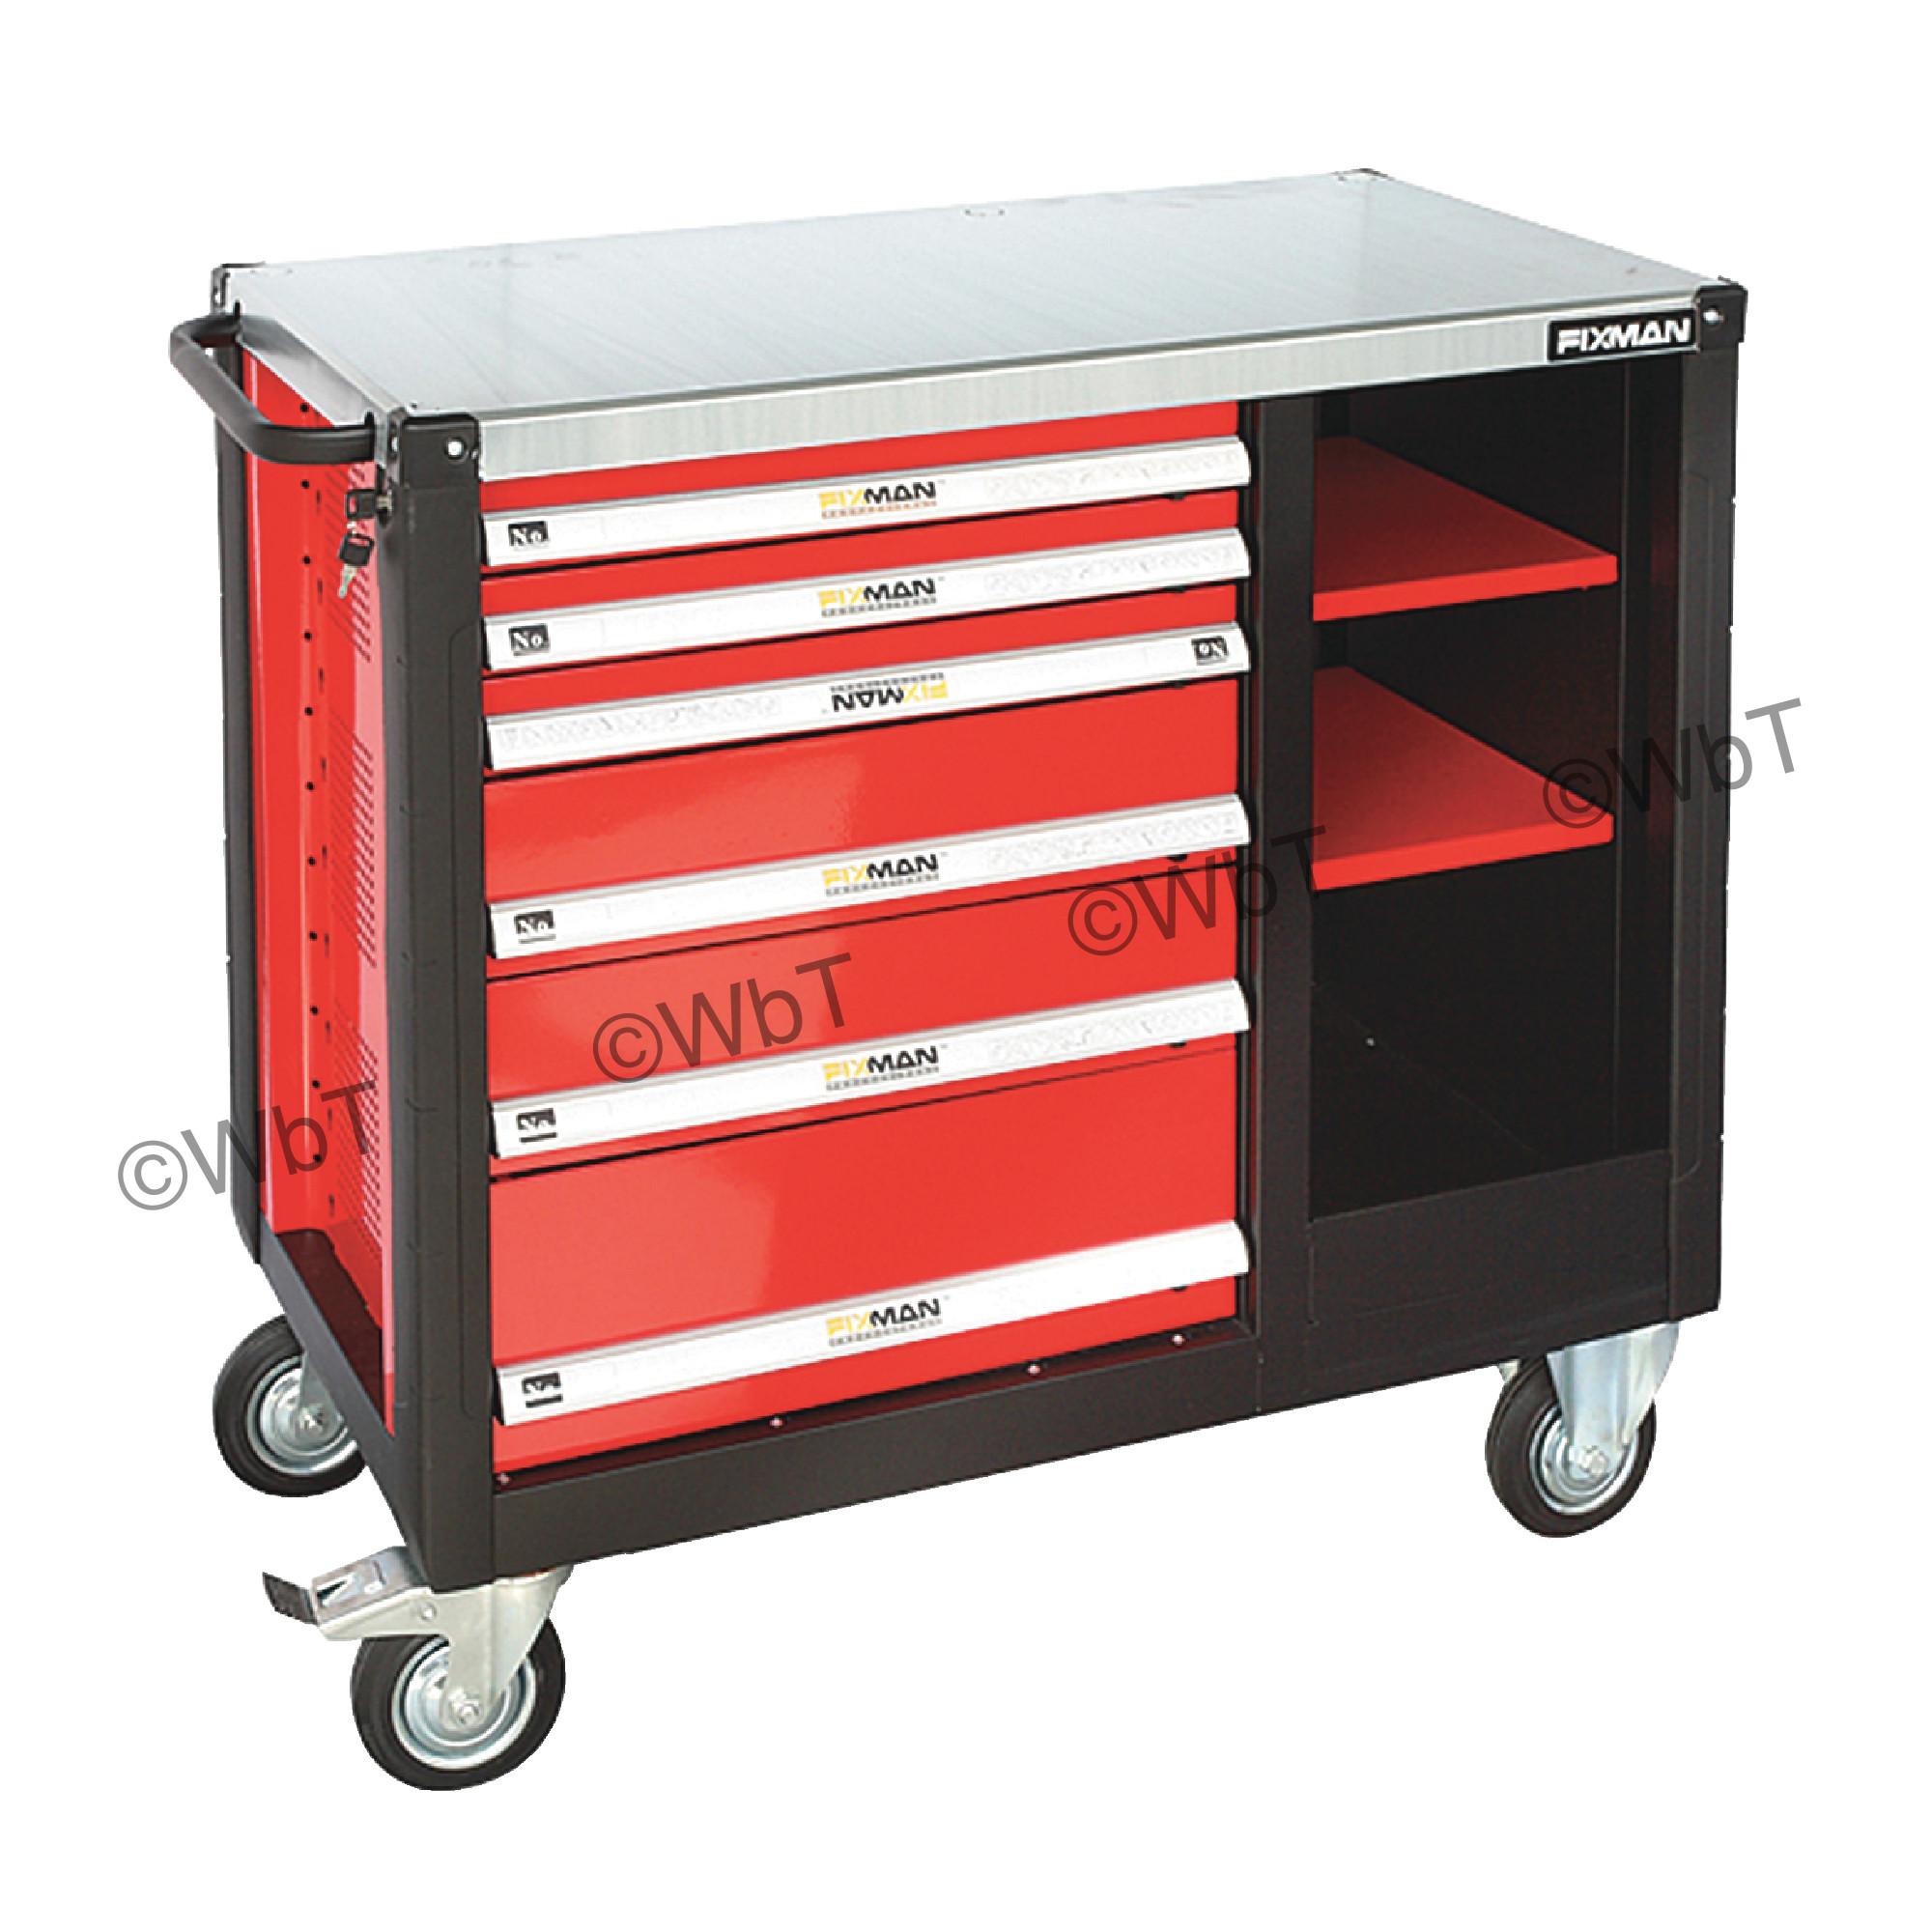 6 Drawer Mobile Workbench